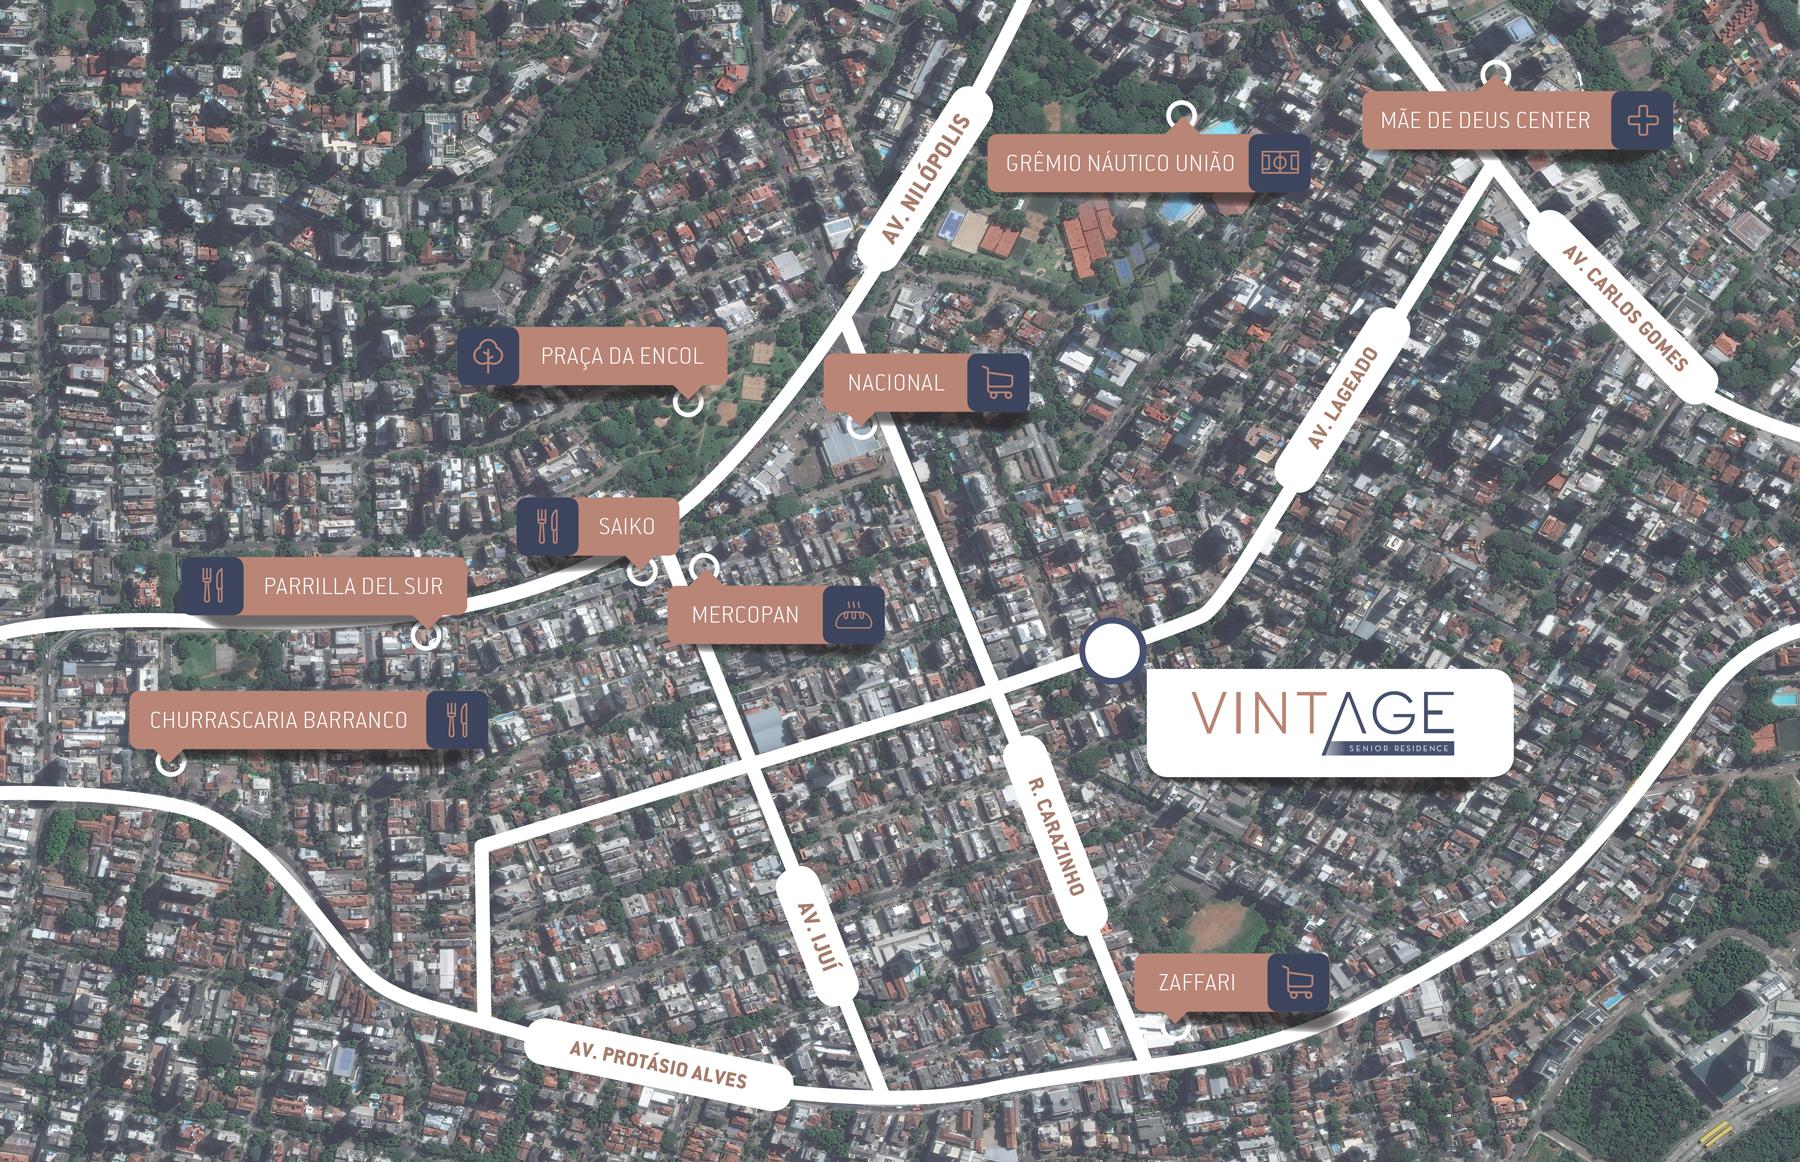 Mapa Vintage Senior Residence